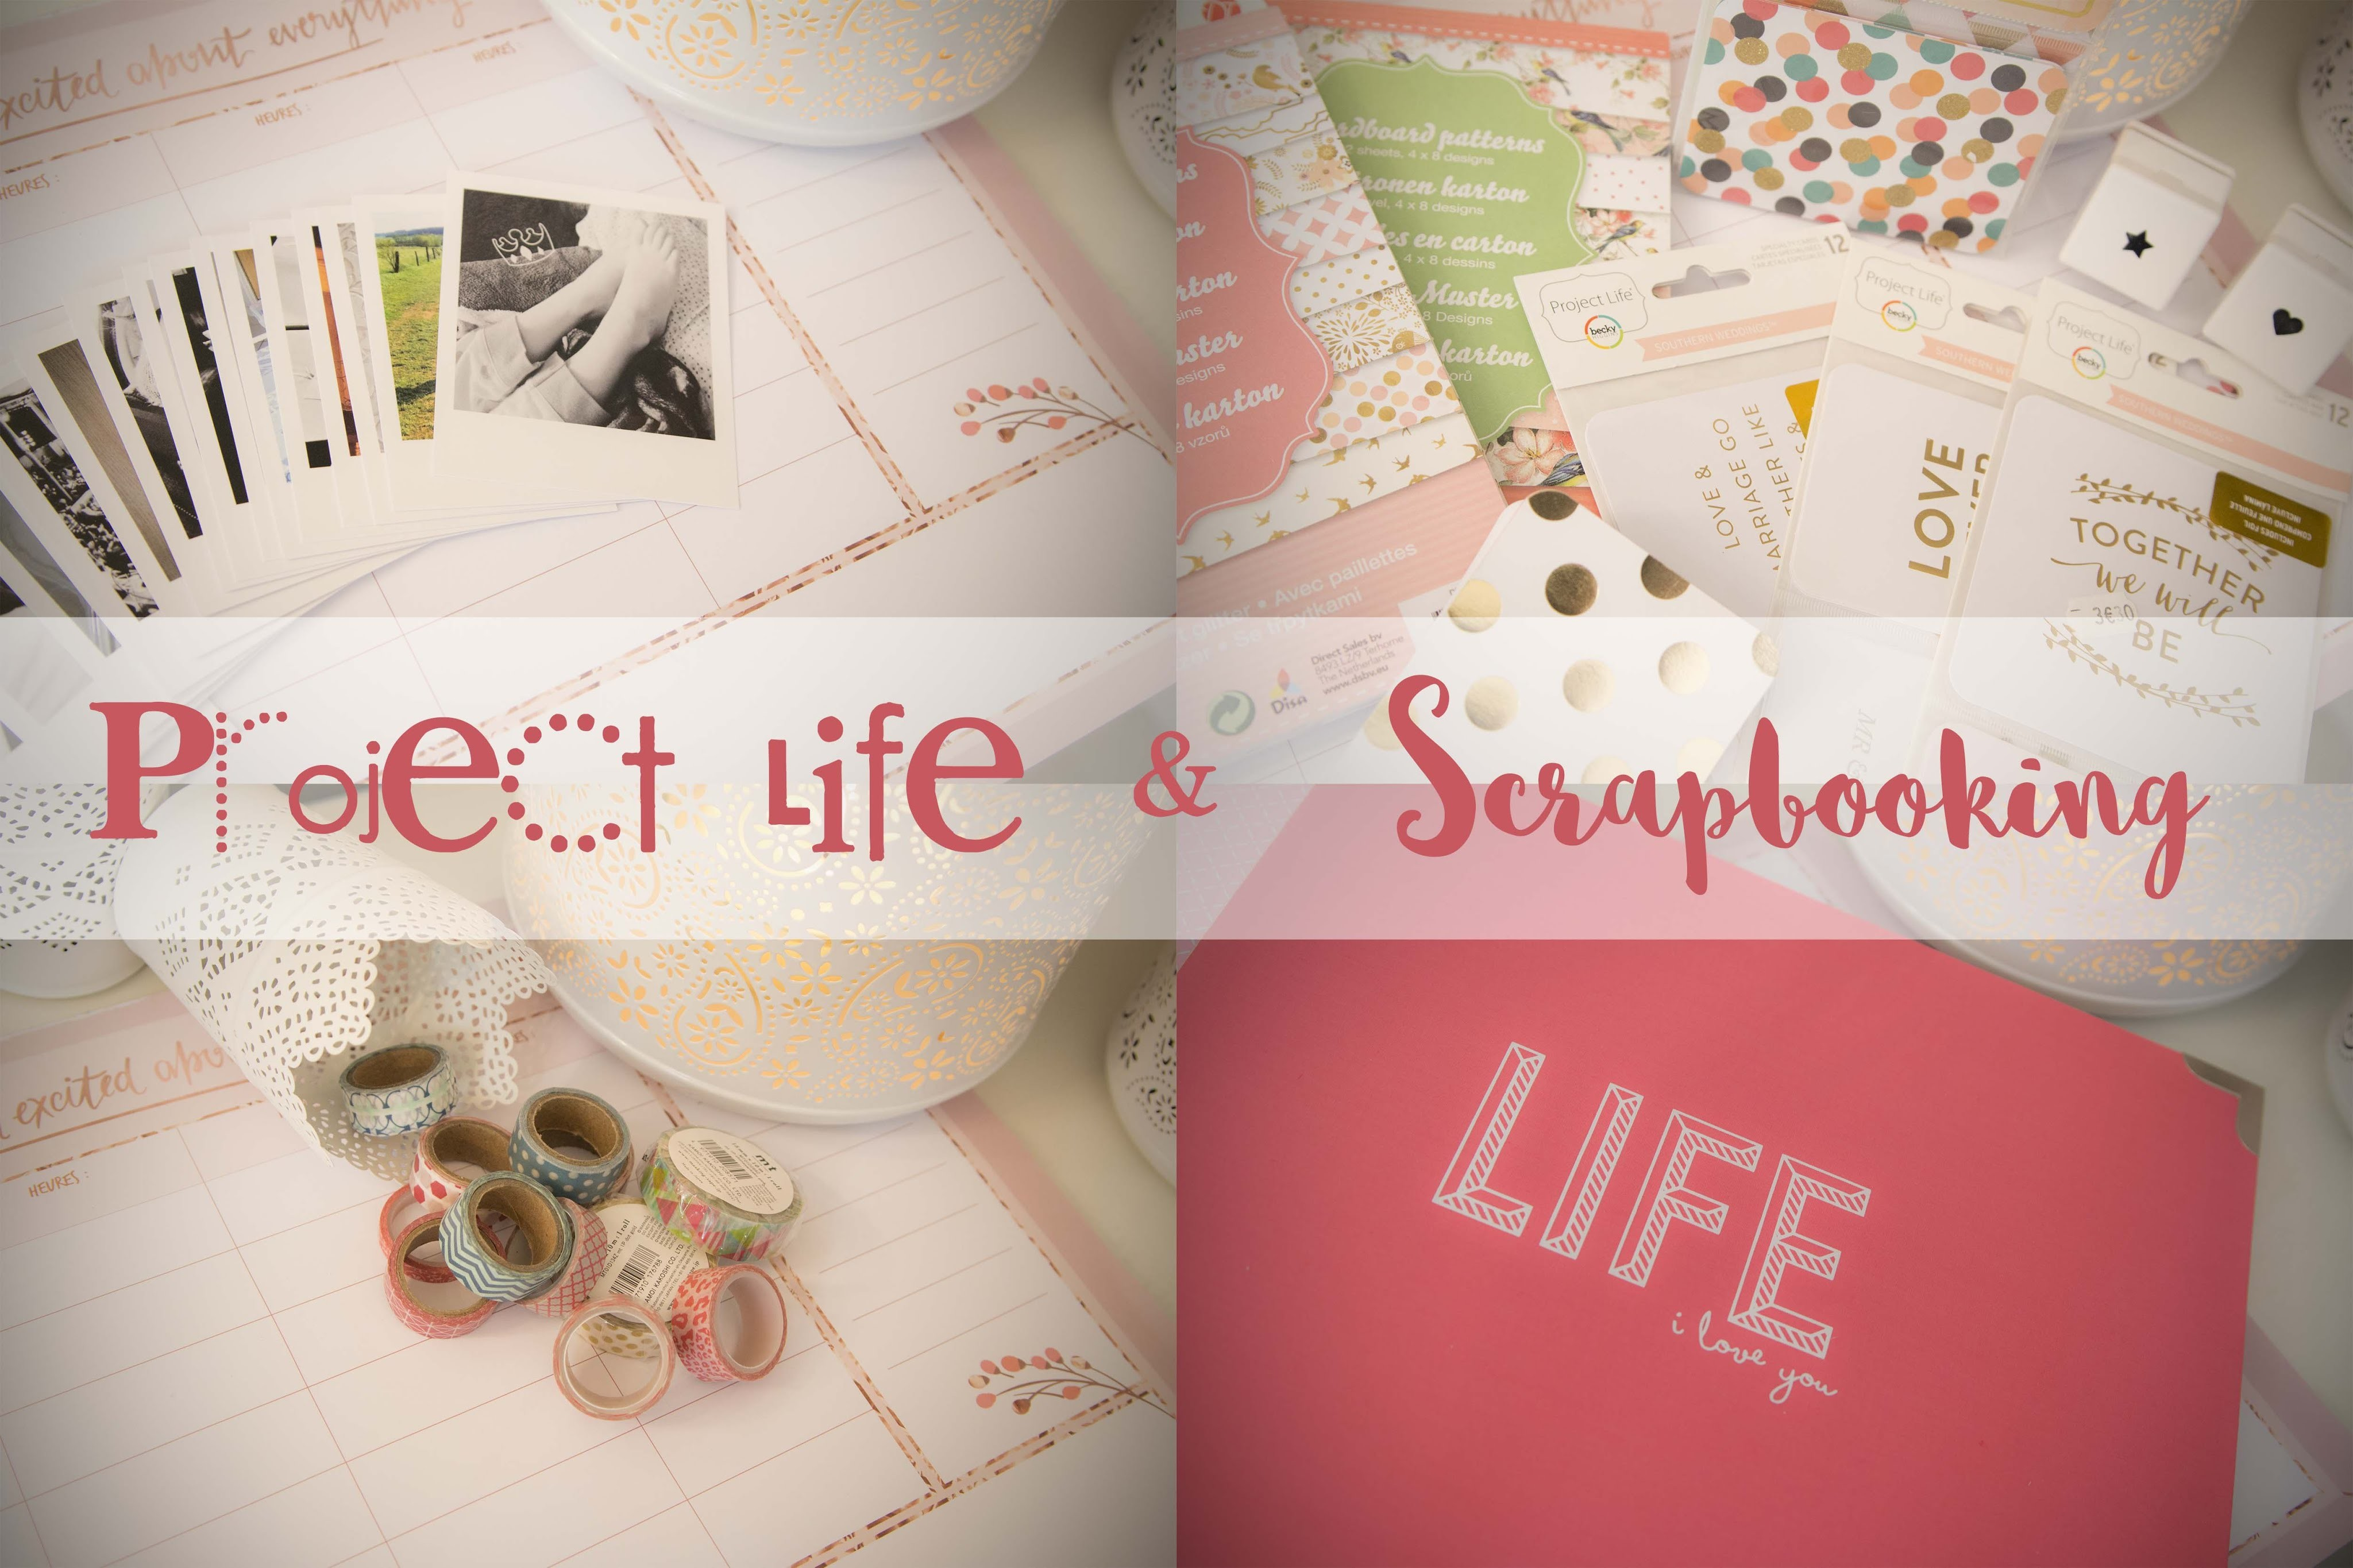 .::. Project Life et Scrapbooking .::.